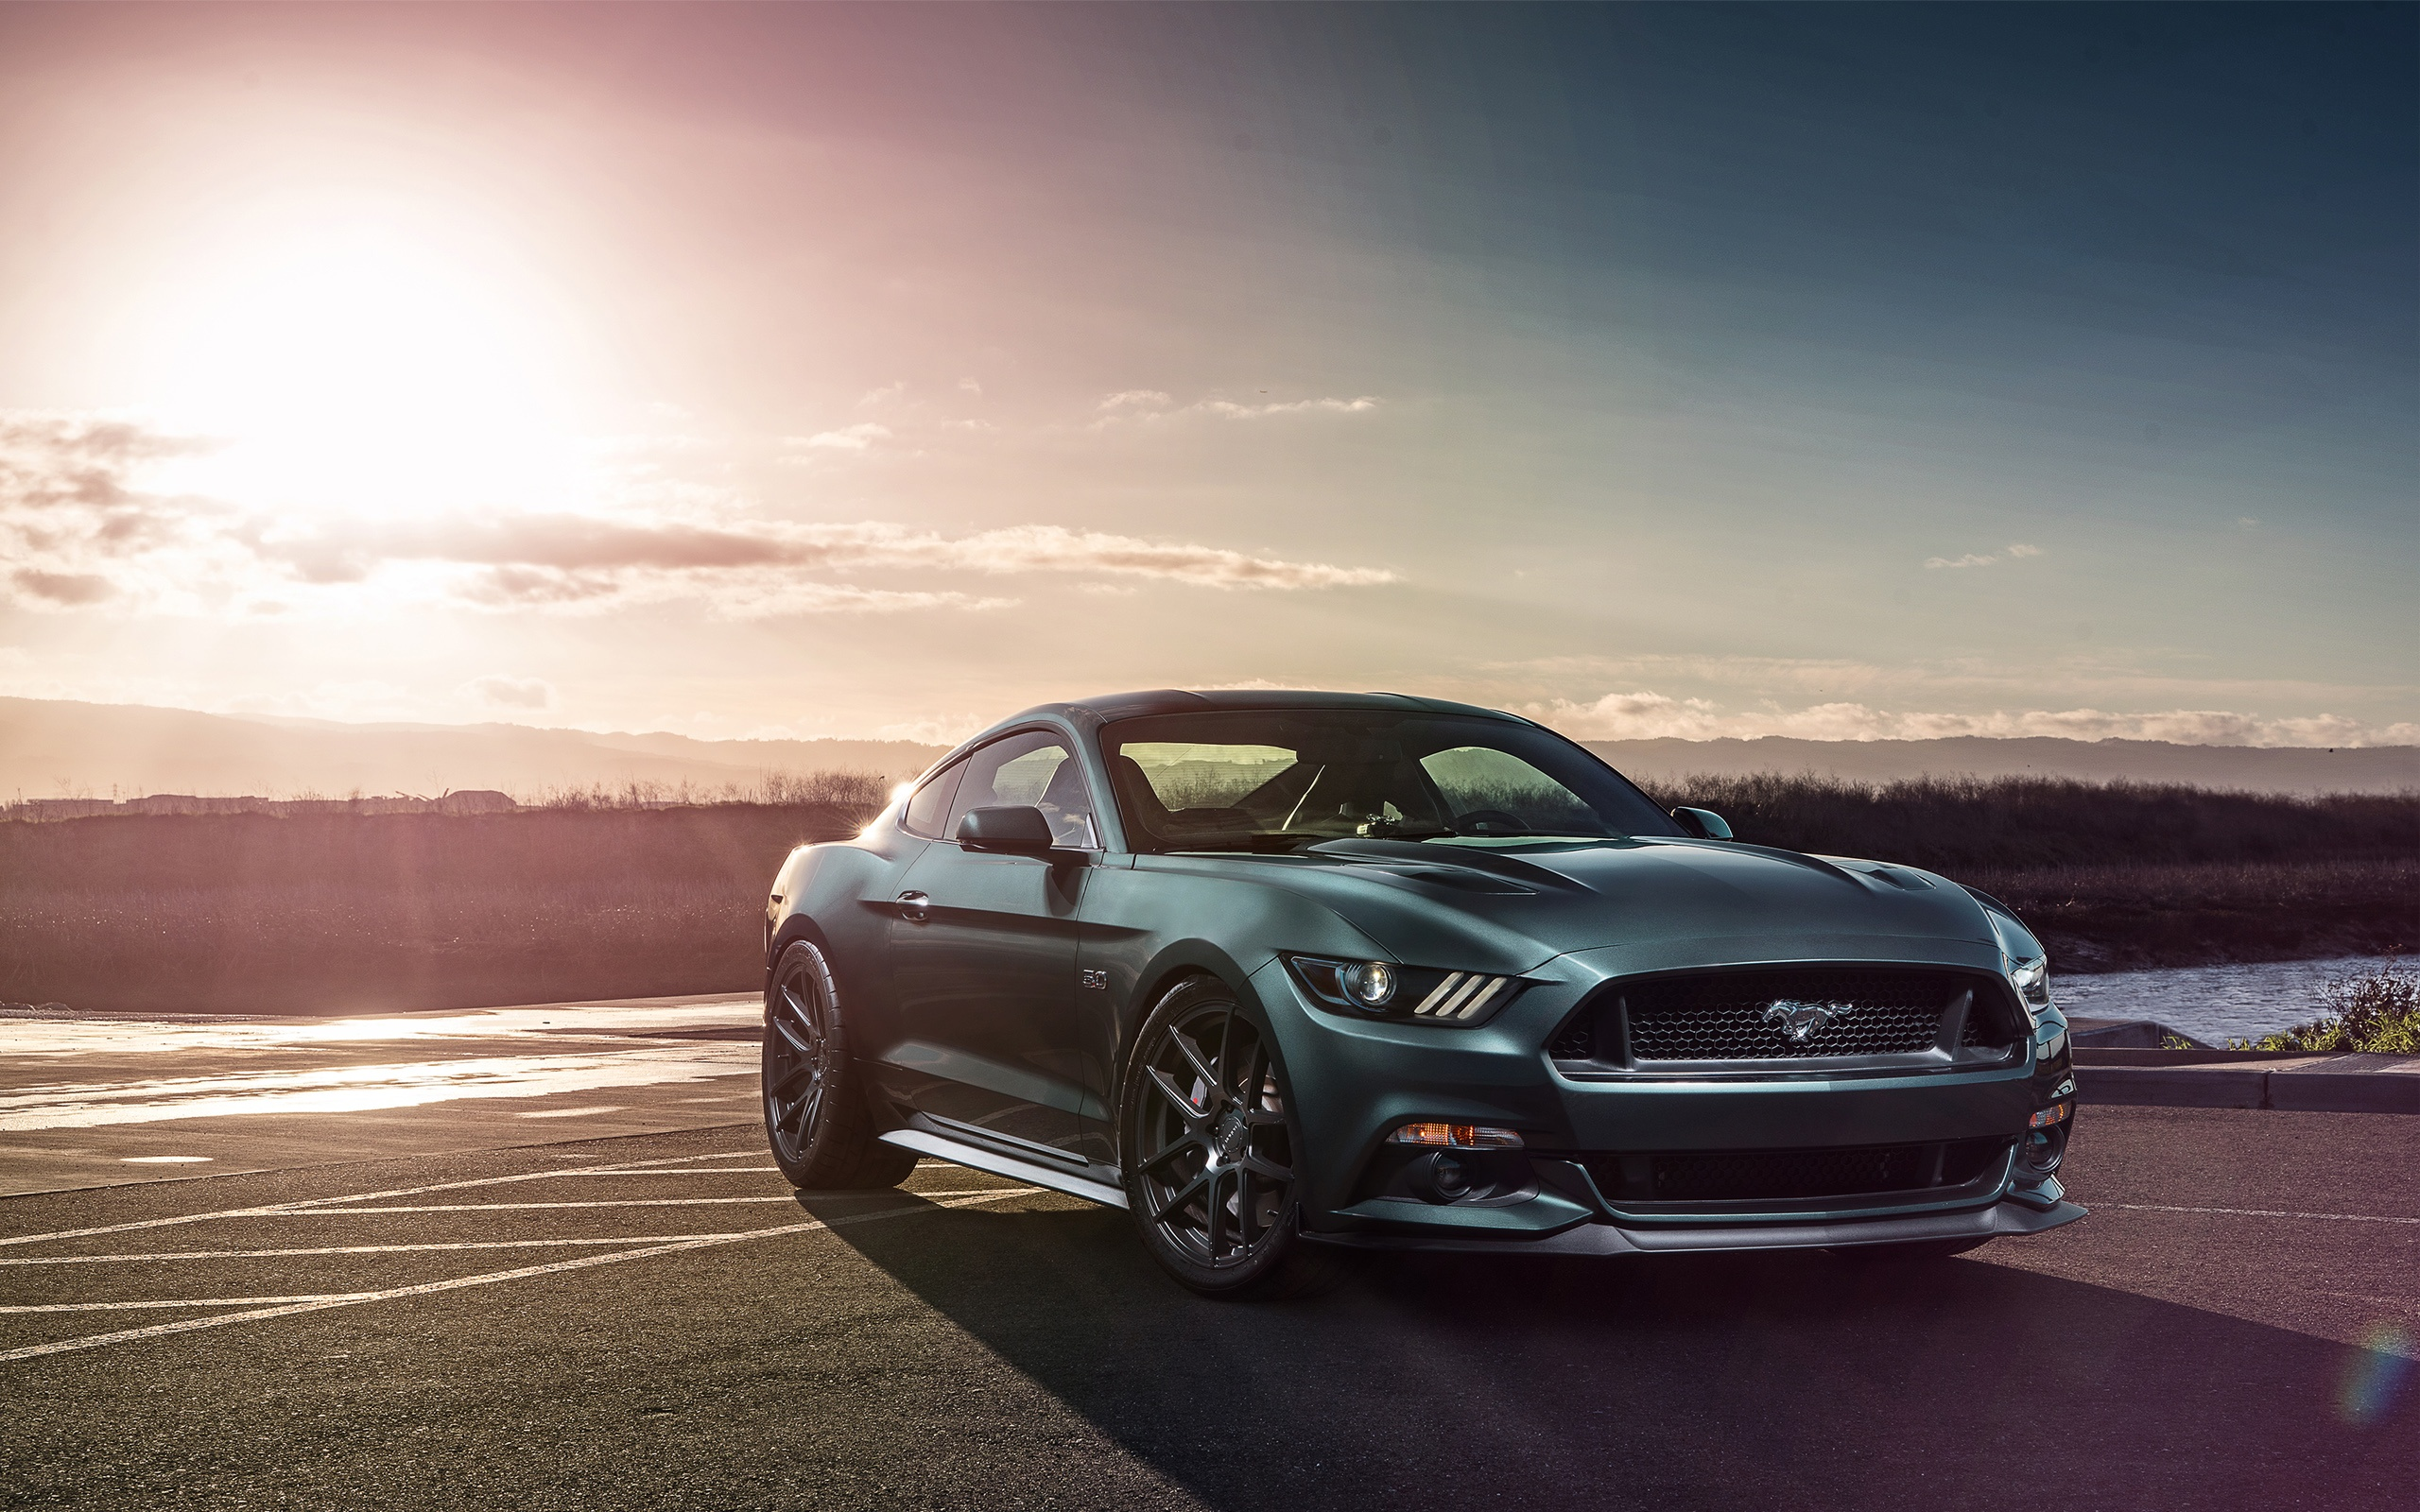 Ford Mustang GT Velgen Wheels Wallpapers In Jpg Format For Free Download